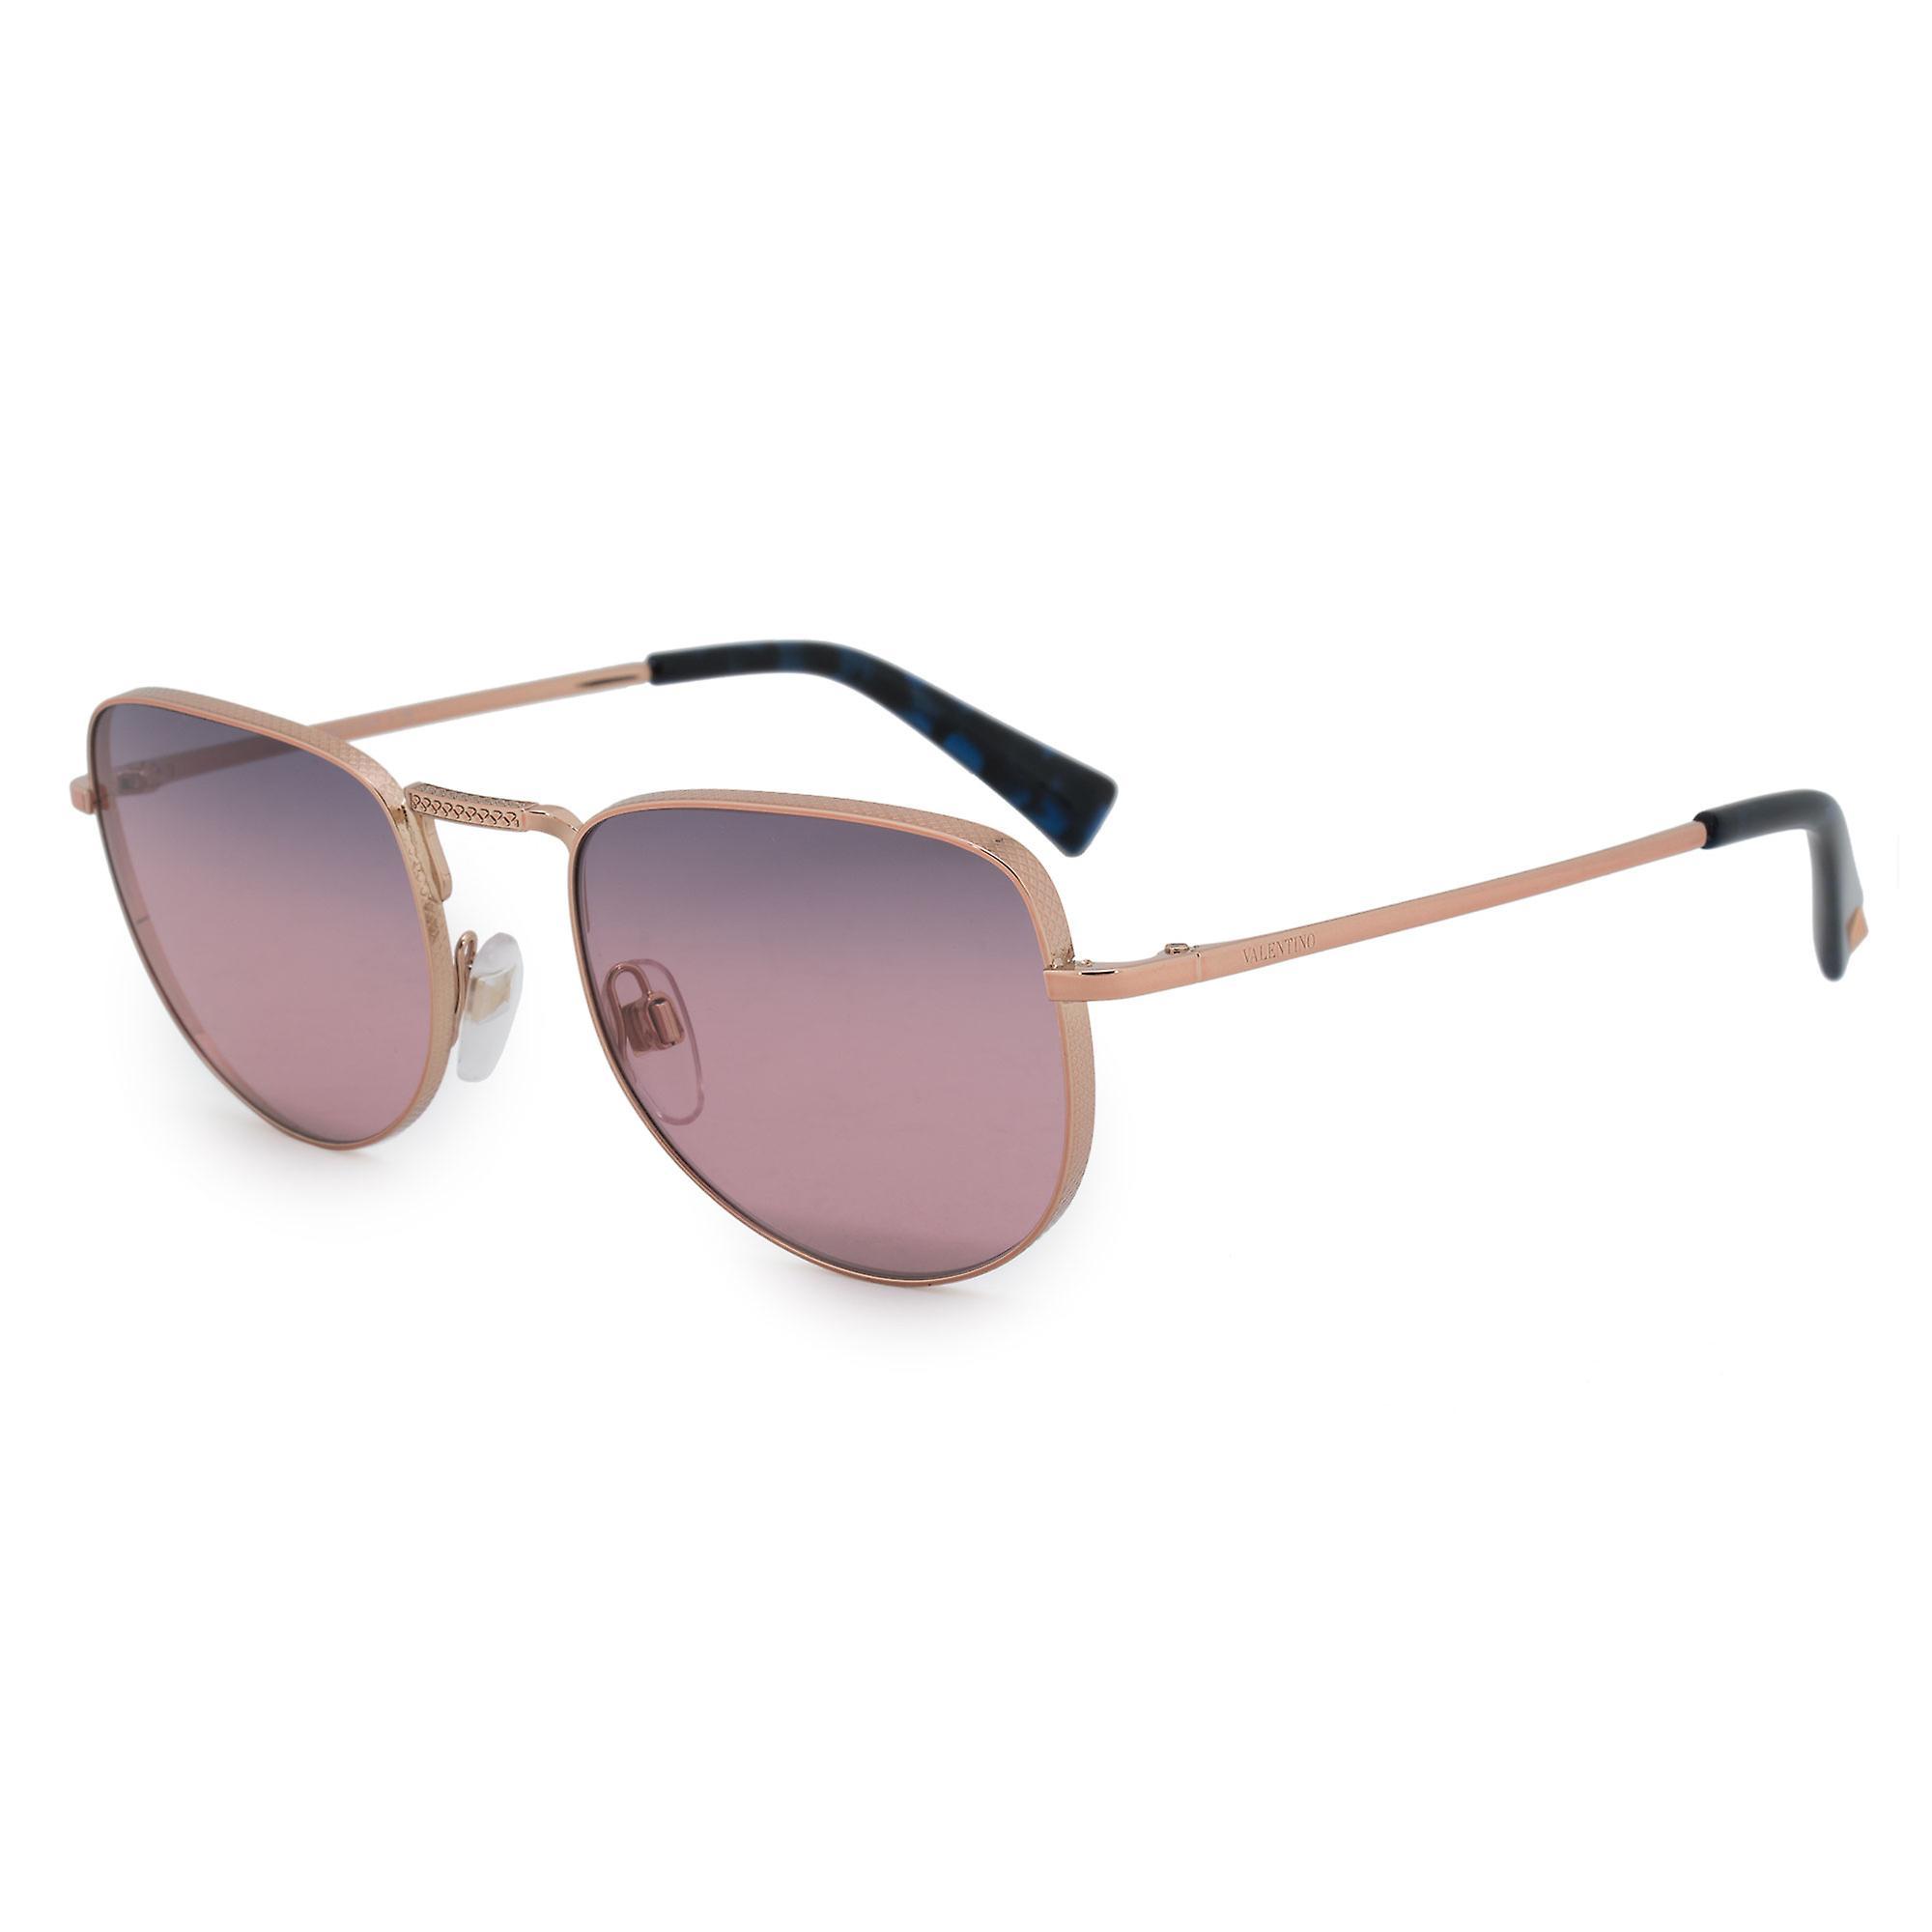 Valentino Square Sunglasses VA2012 3004E6 49